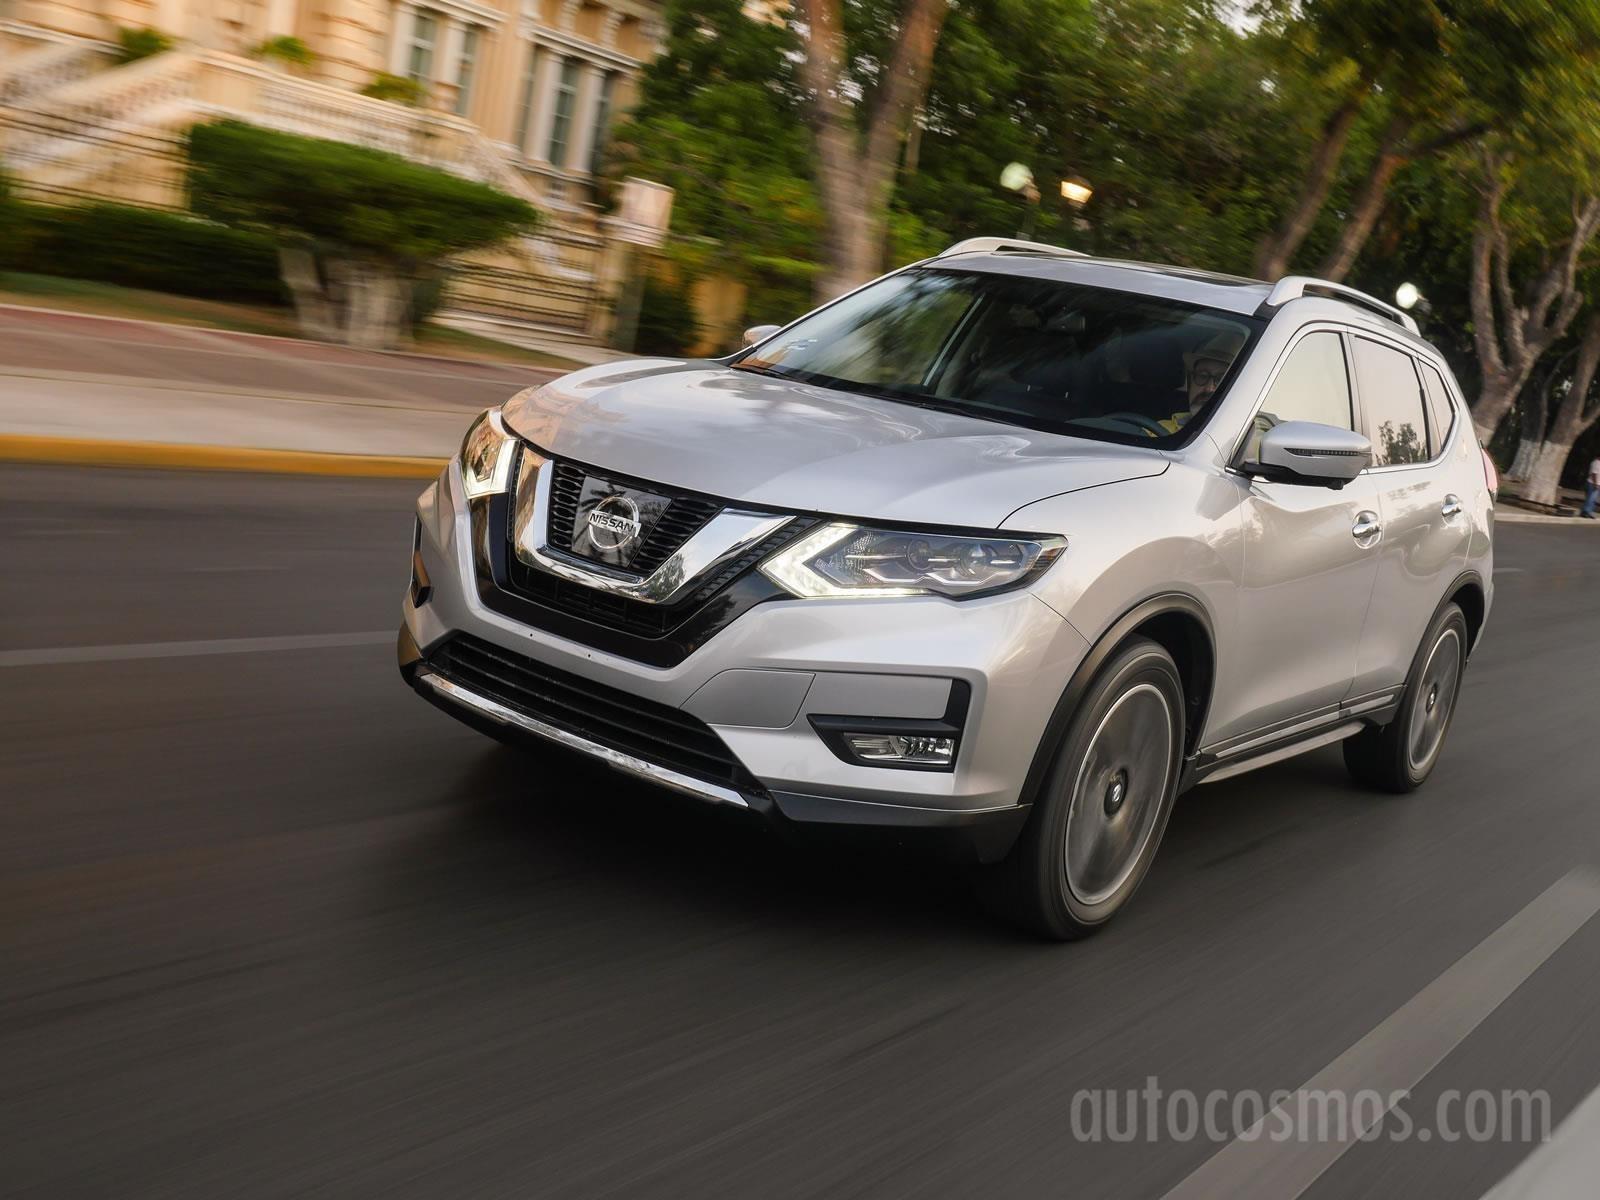 Renault Alaskan 2018 >> Nissan X-Trail 2018 - Autocosmos.com